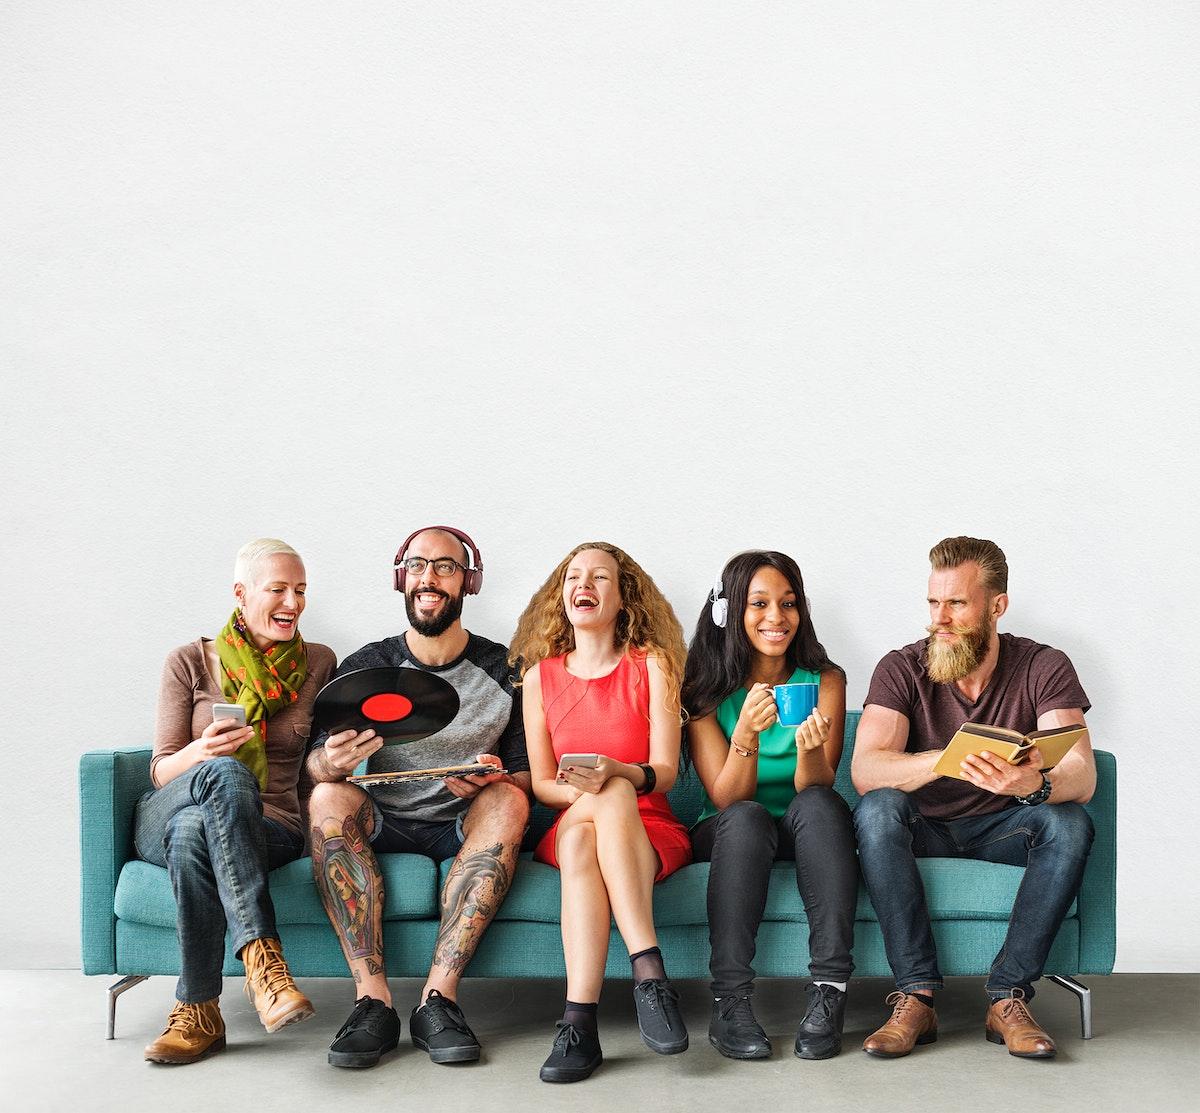 A group of international friends